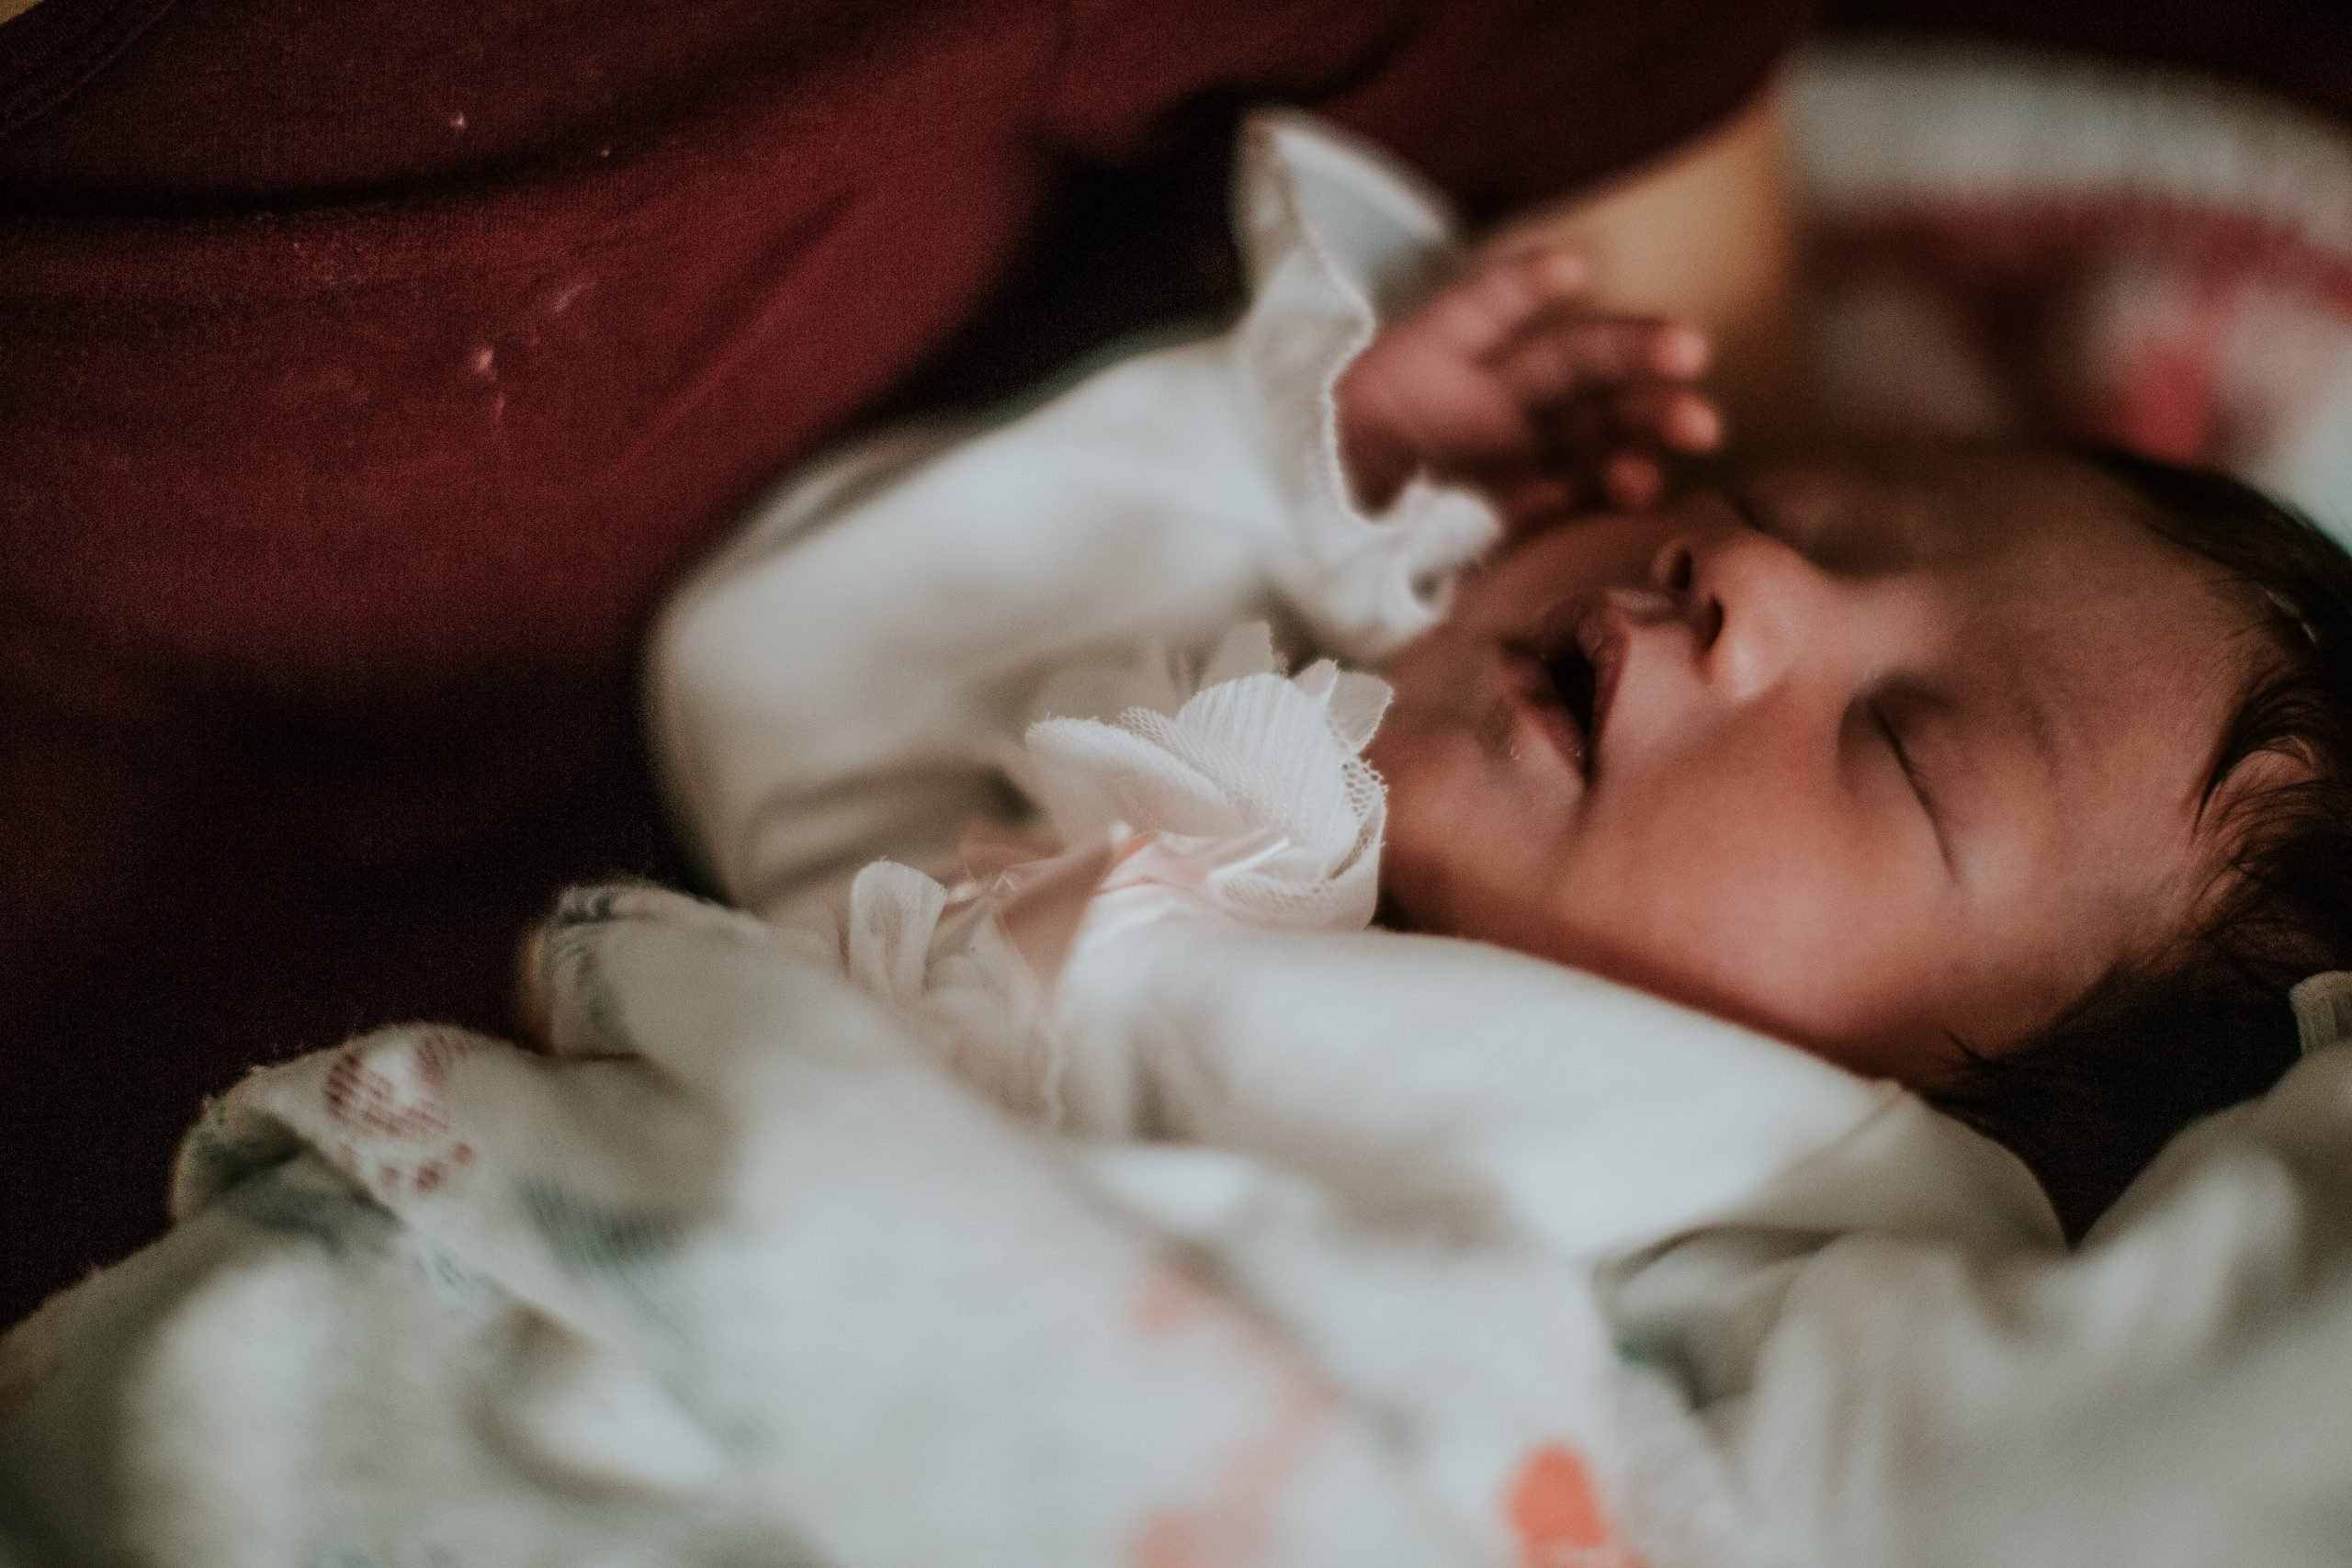 Becoming a Night Nanny